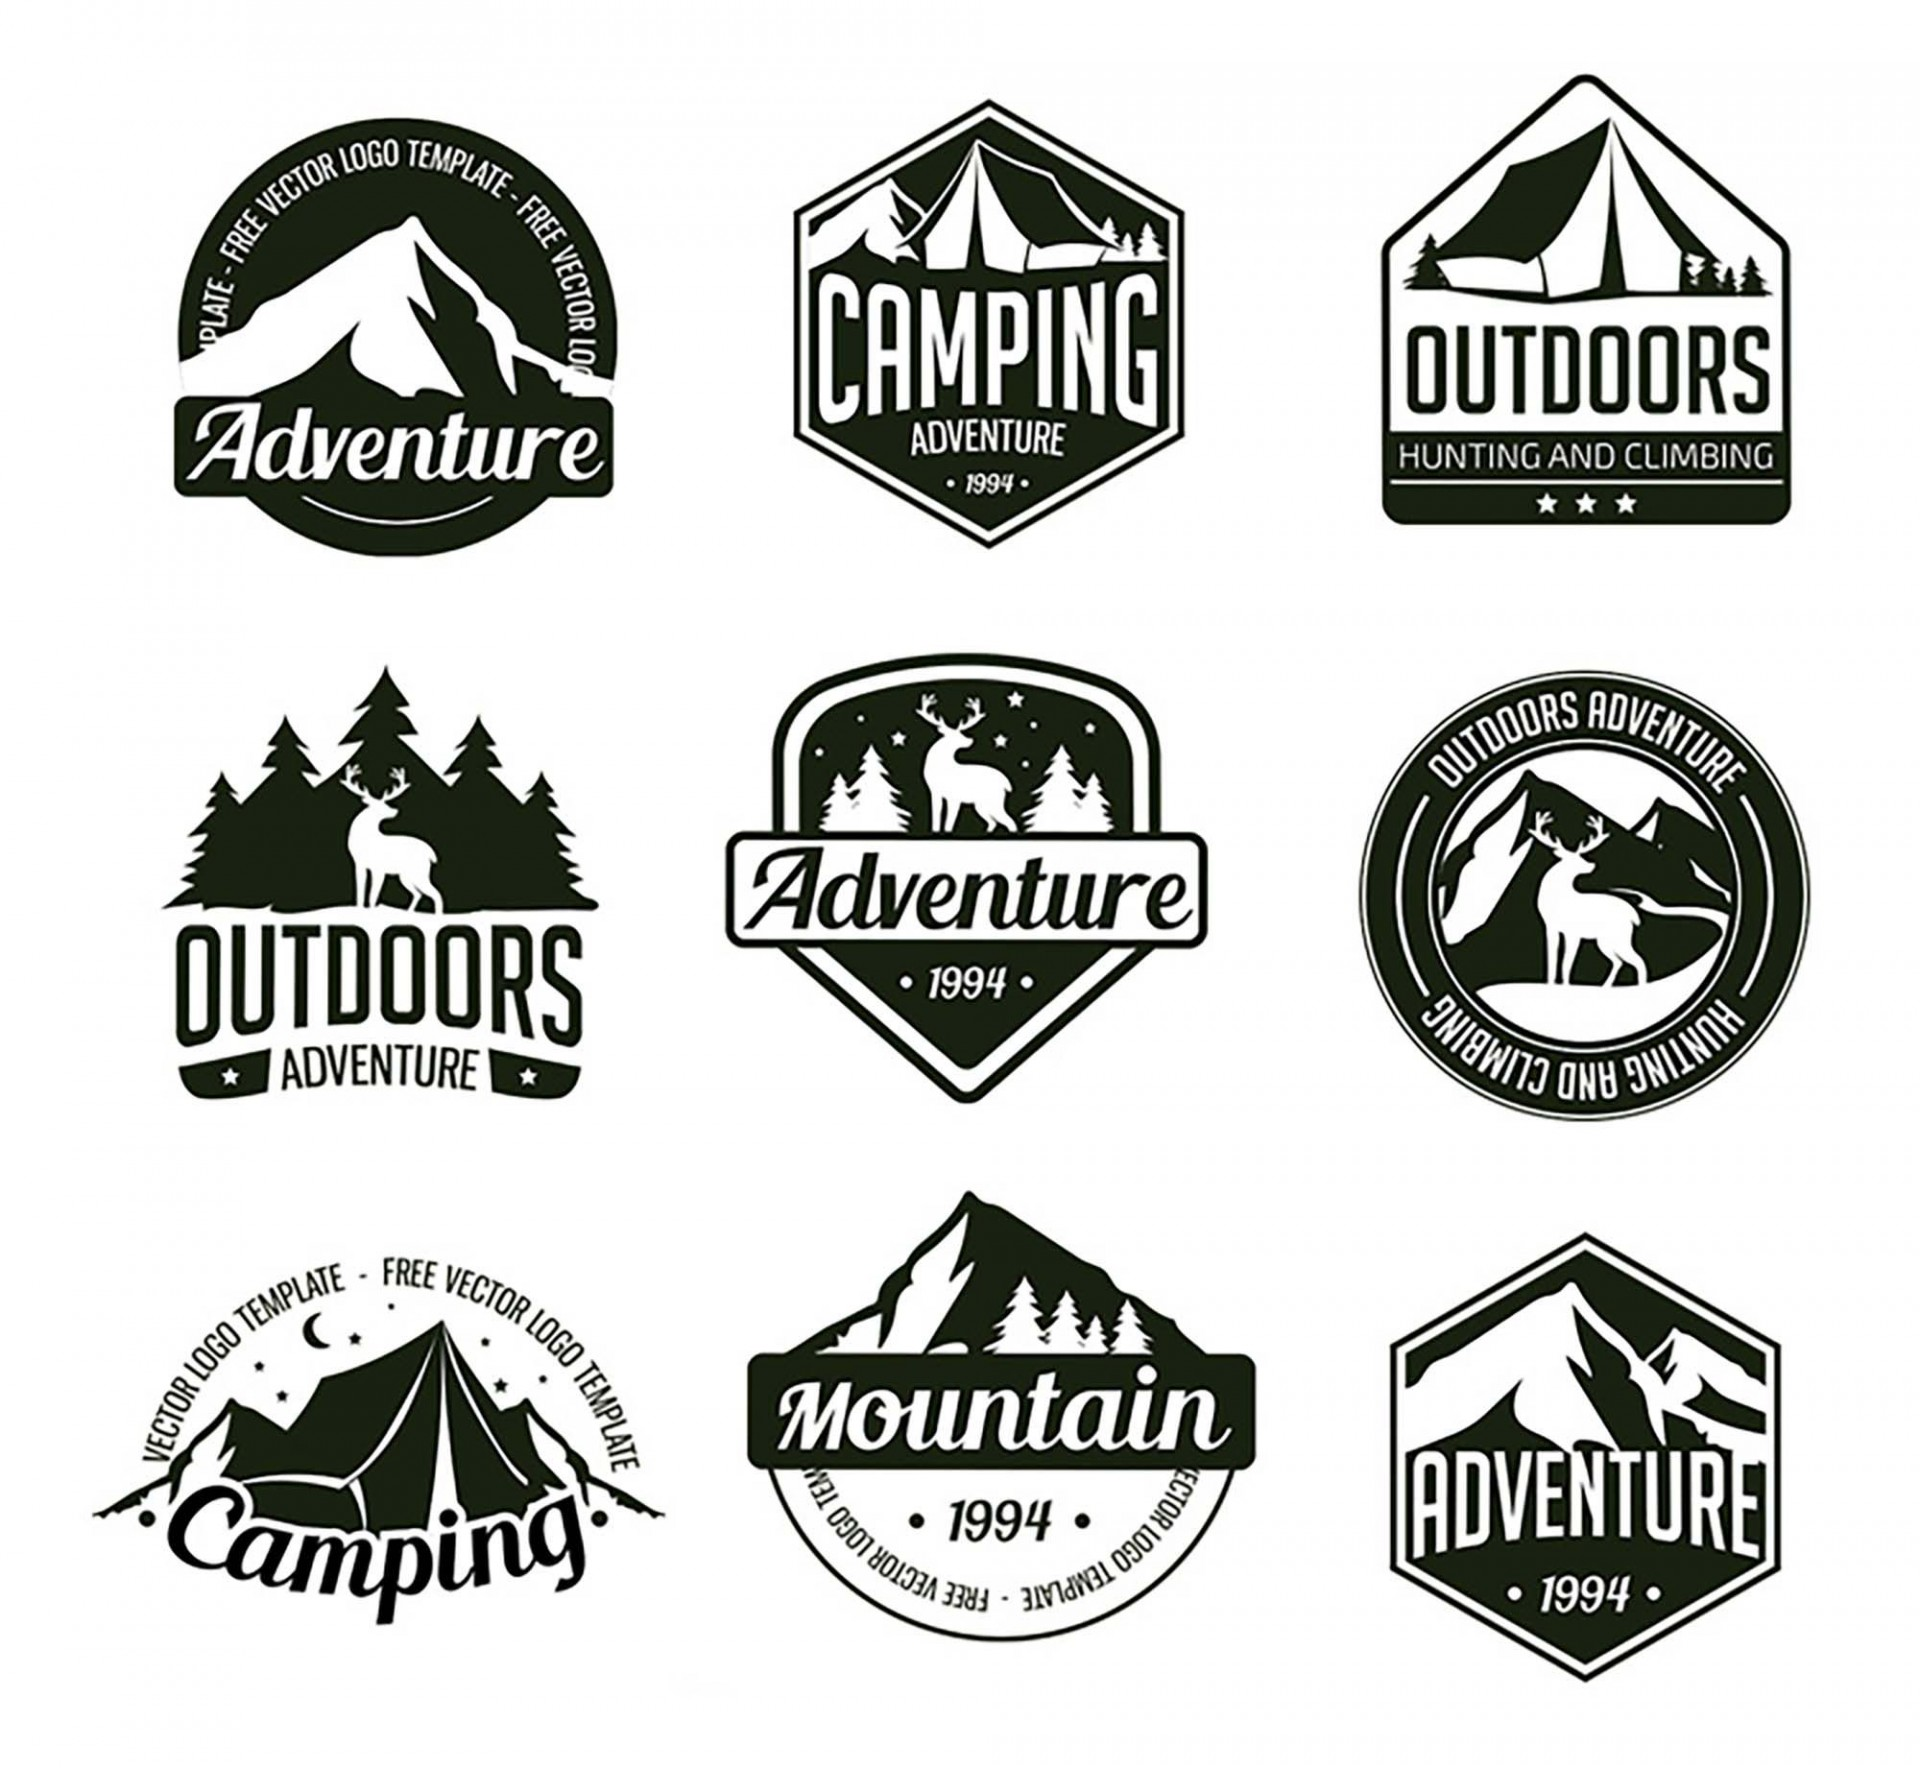 001 Outstanding Free Logo Template Psd Inspiration  Photoshop Mockup1920